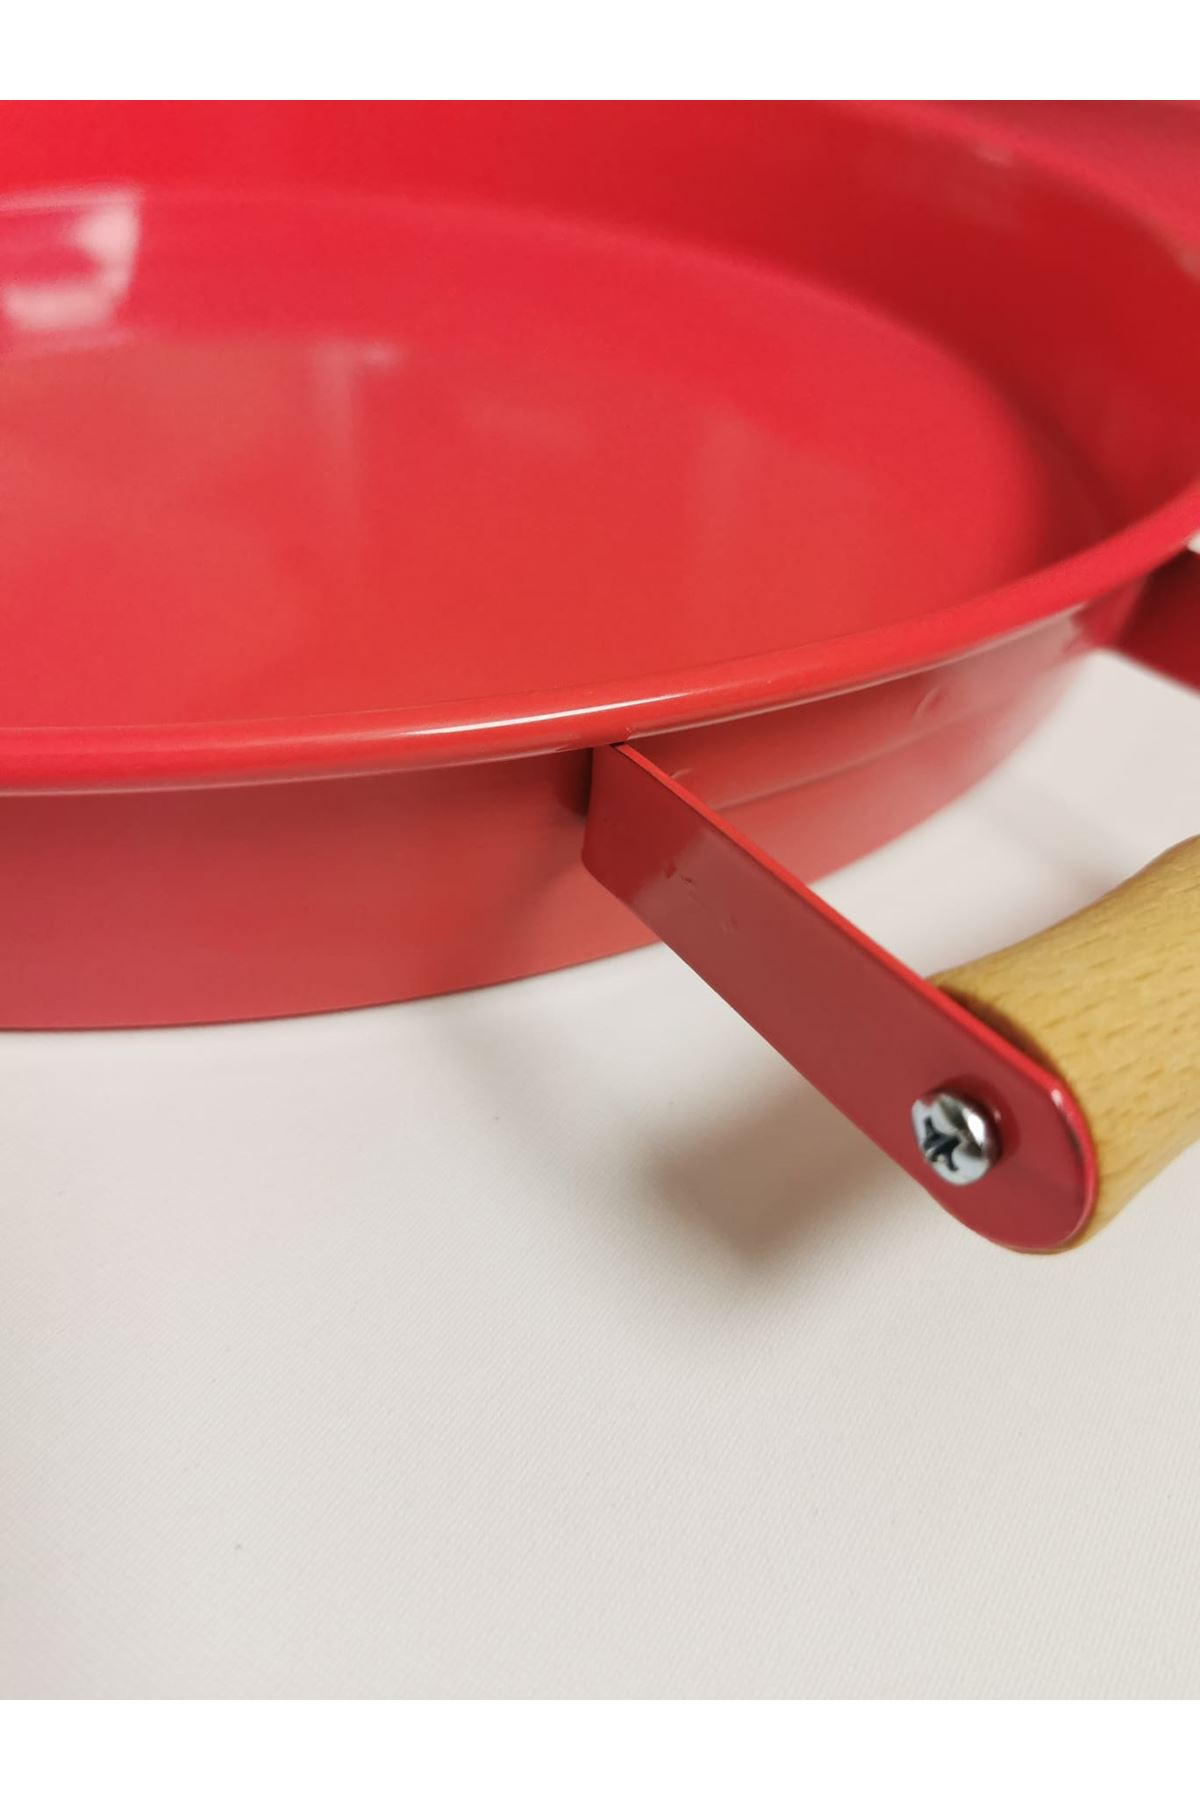 Kitchen Trend 51 Cm Ahşap Kulplu Metal Yuvarlak Pembe Tepsi Sunum Tepsi, Kahvaltı Tepsisi